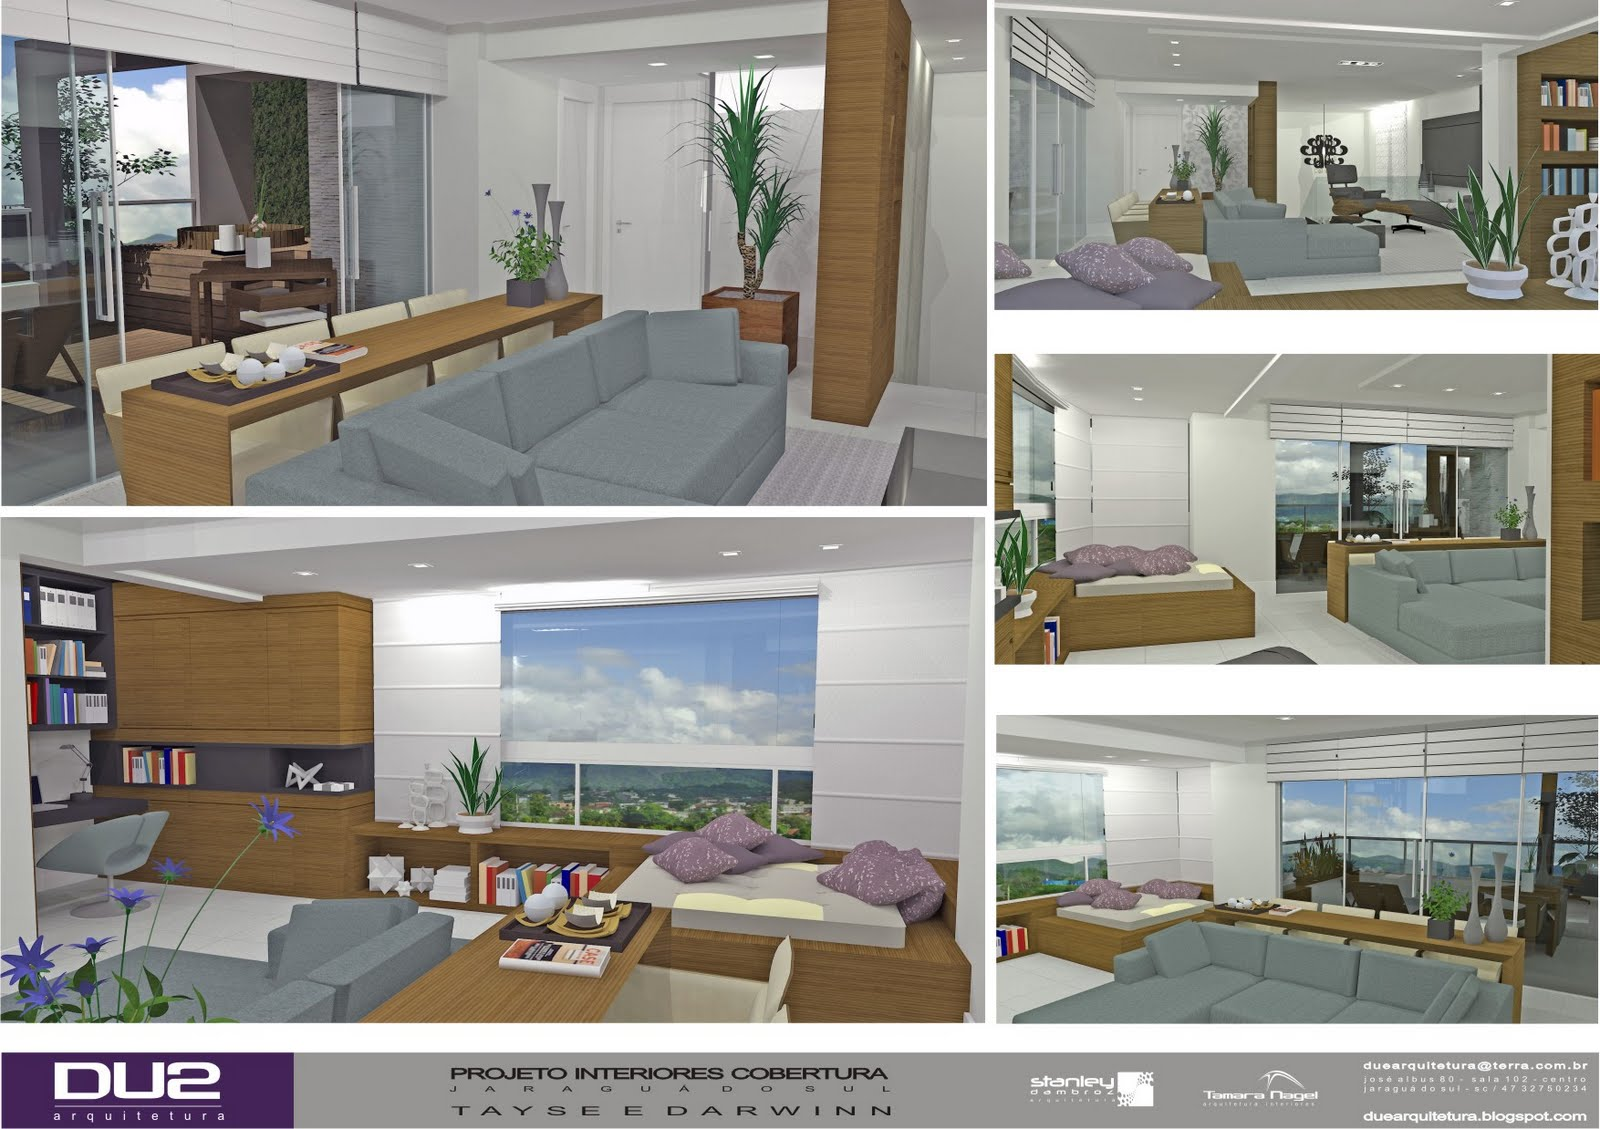 Excepcional DUE ARQUITETURA: Projeto Interiores Duplex - Parte II PX08